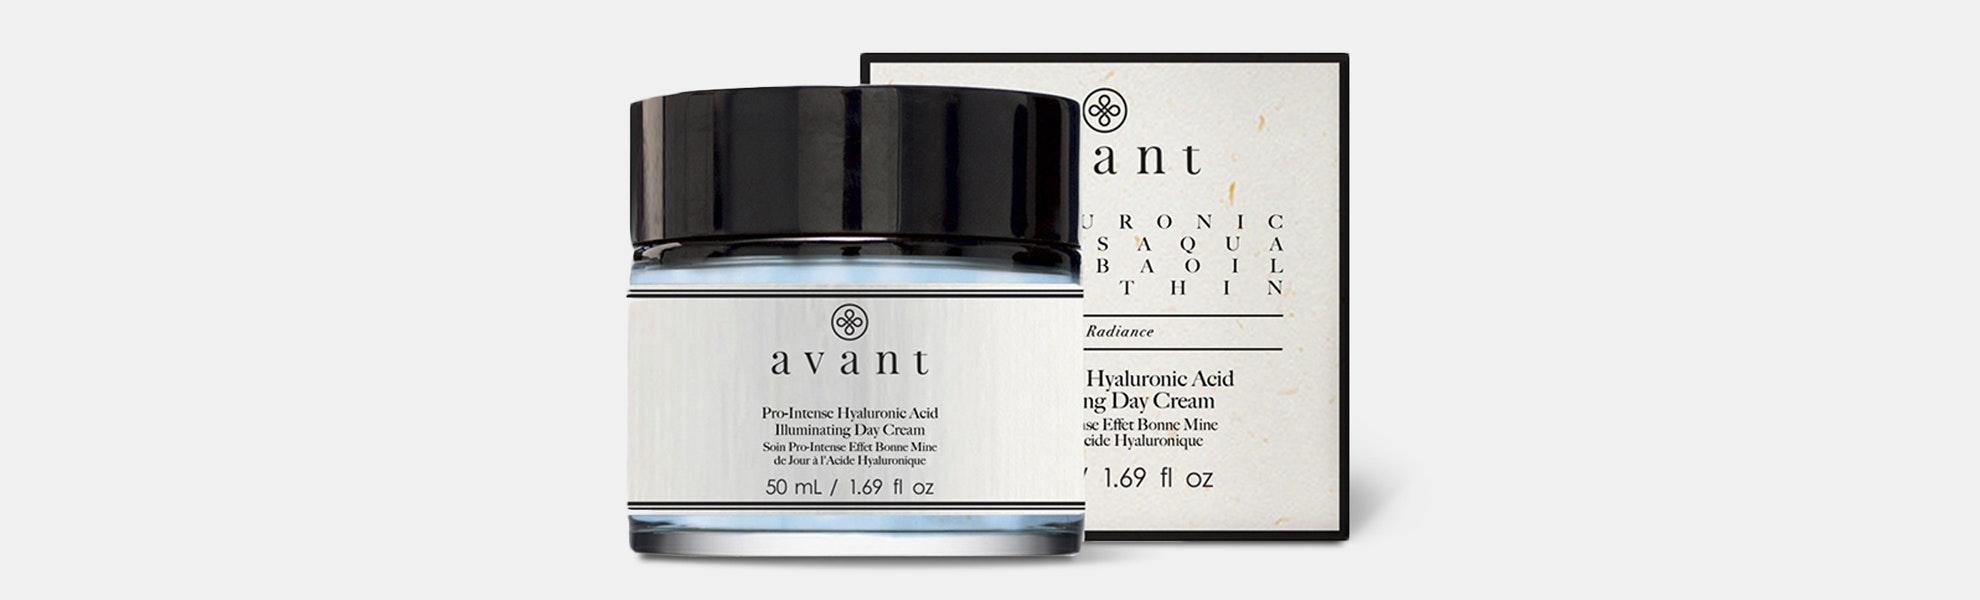 Avant Skincare Pro-Intense Illuminating Day Cream